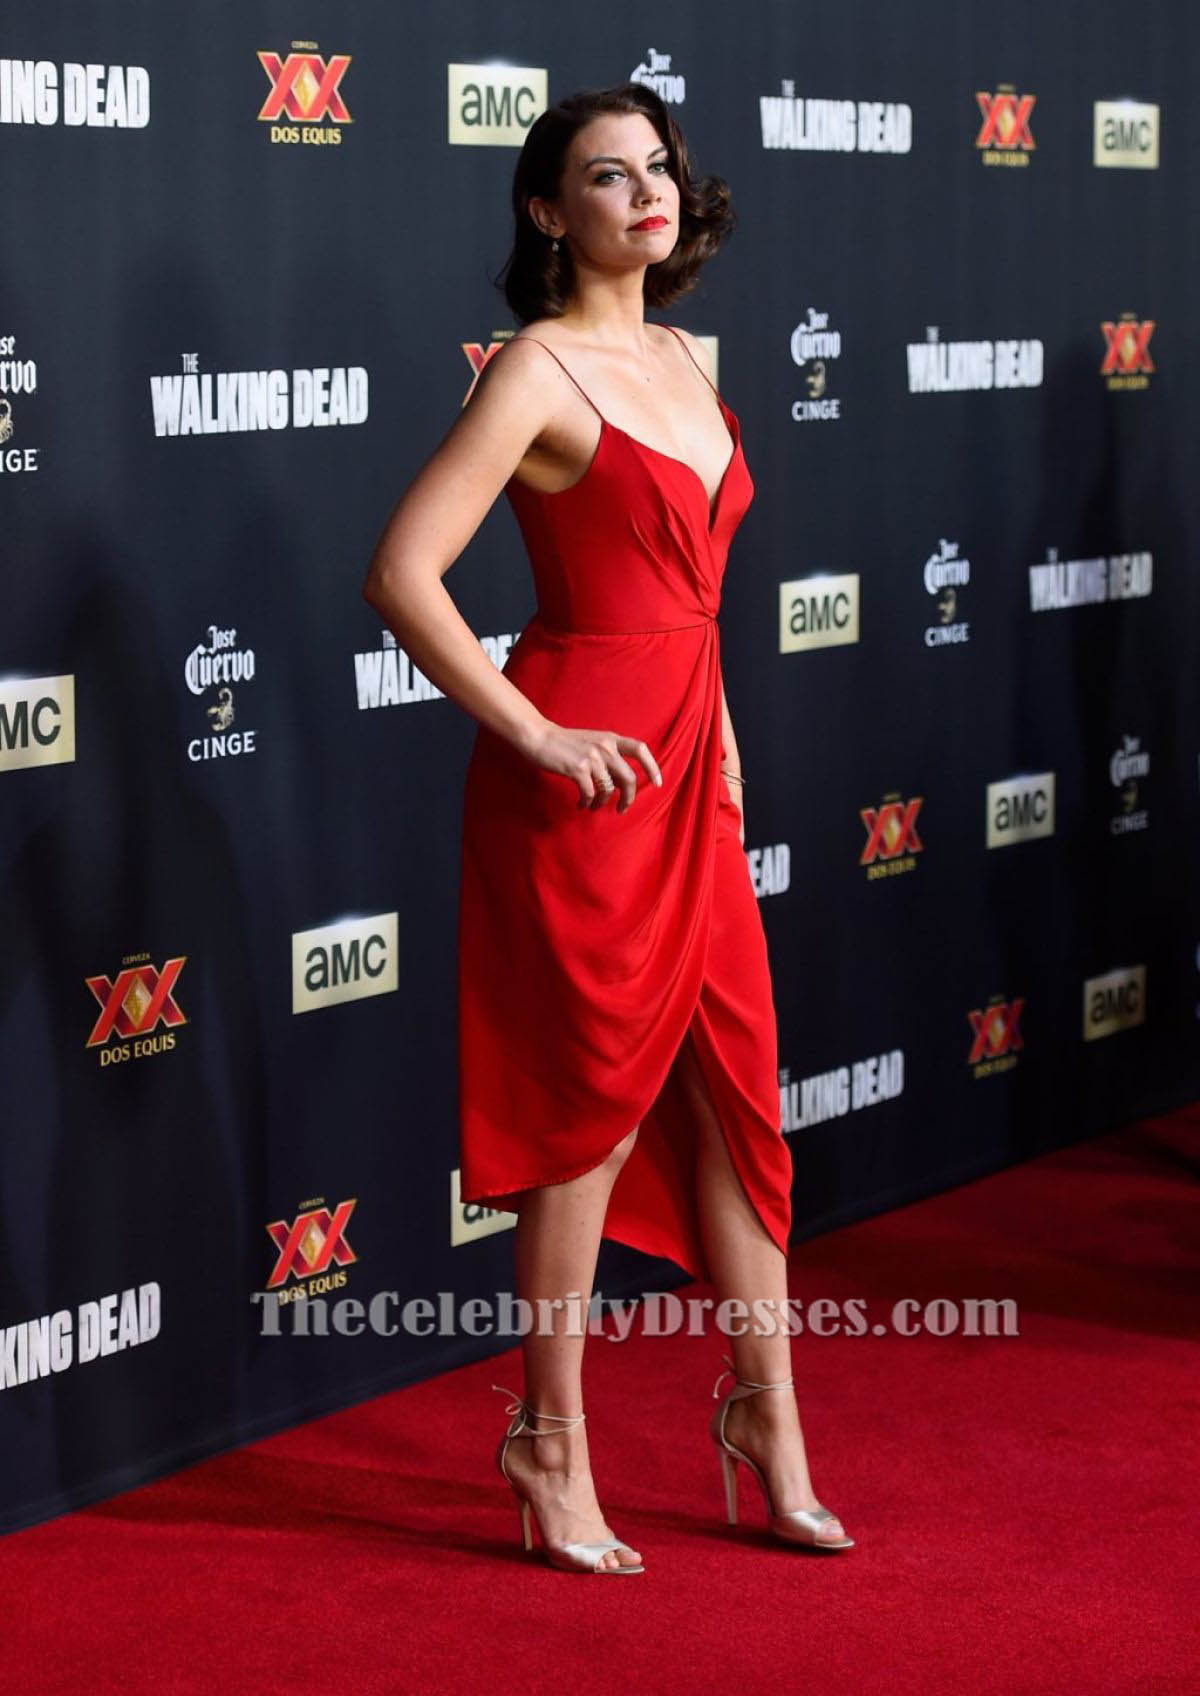 Lauren Cohan Red Cocktail Dress Walking Dead Season 5